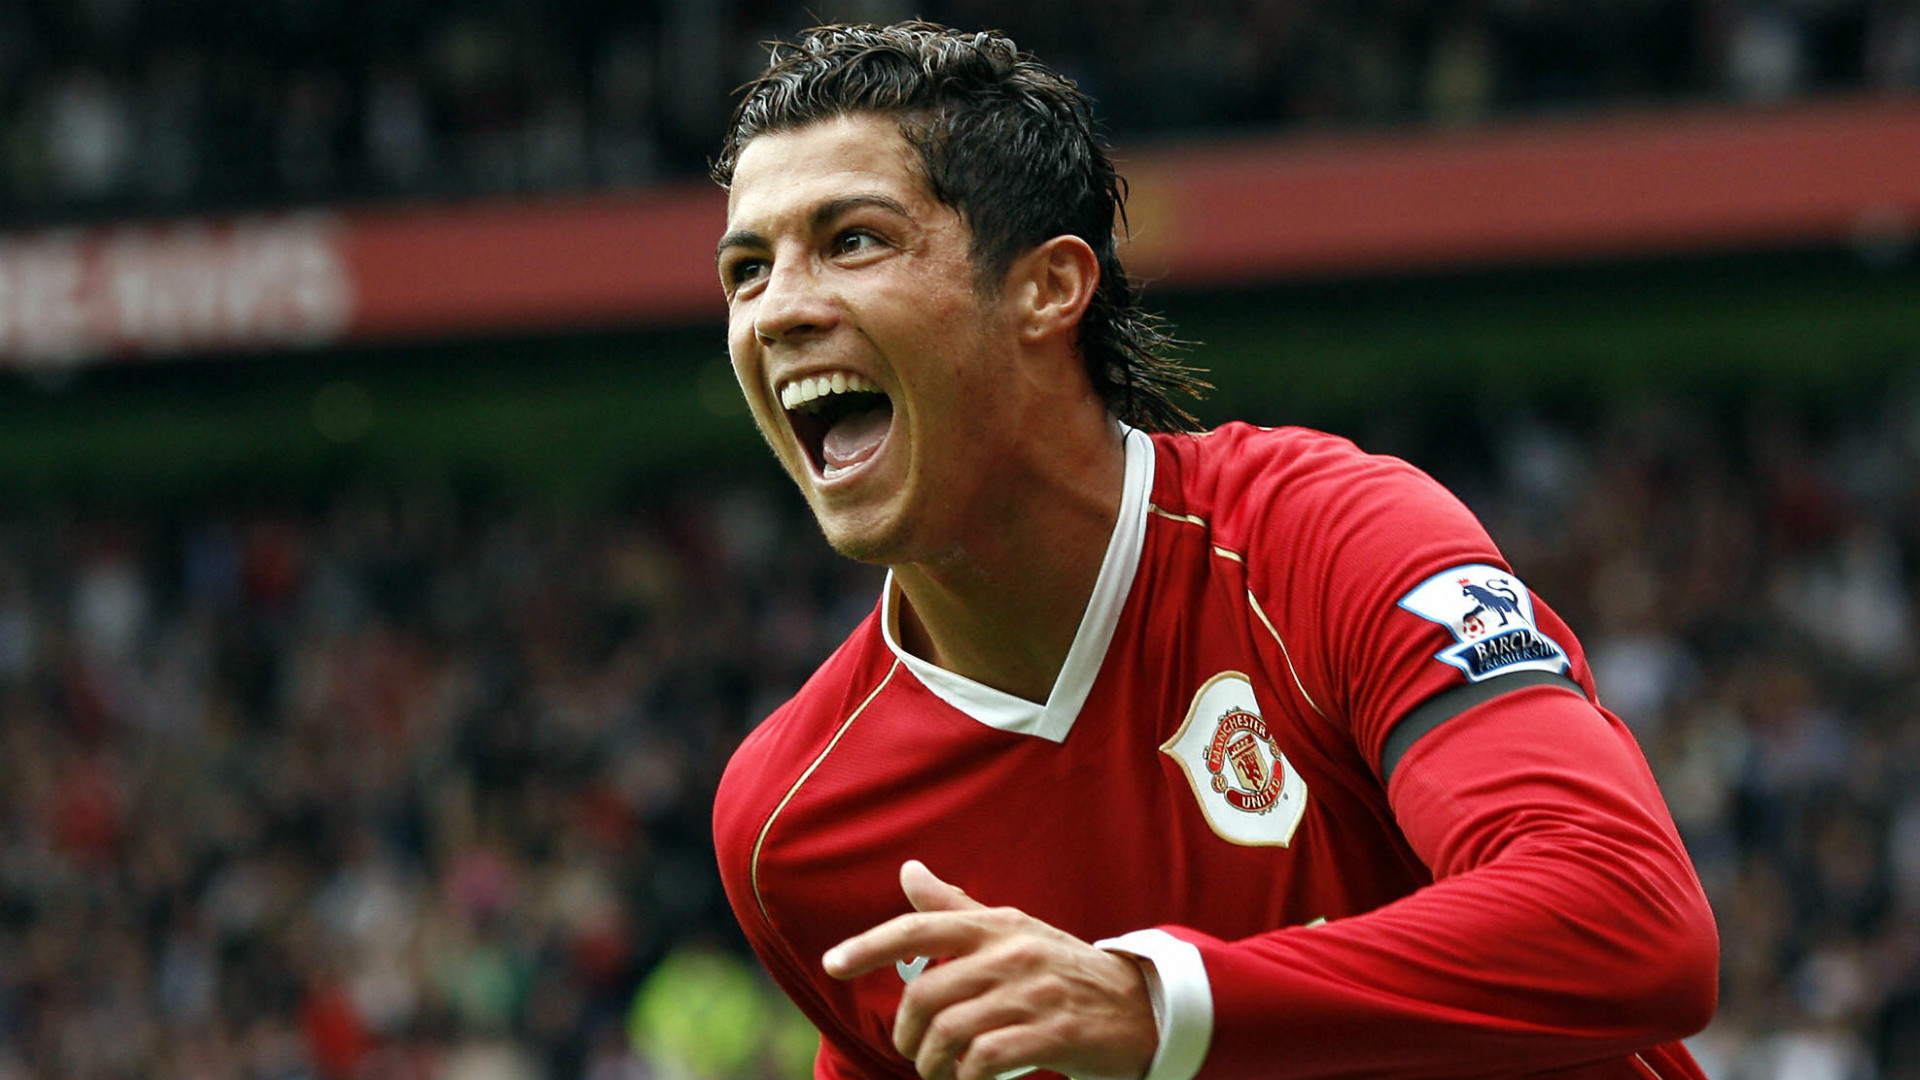 Cristiano Ronaldo Haircuts The Real Madrid Stars Most Memorable